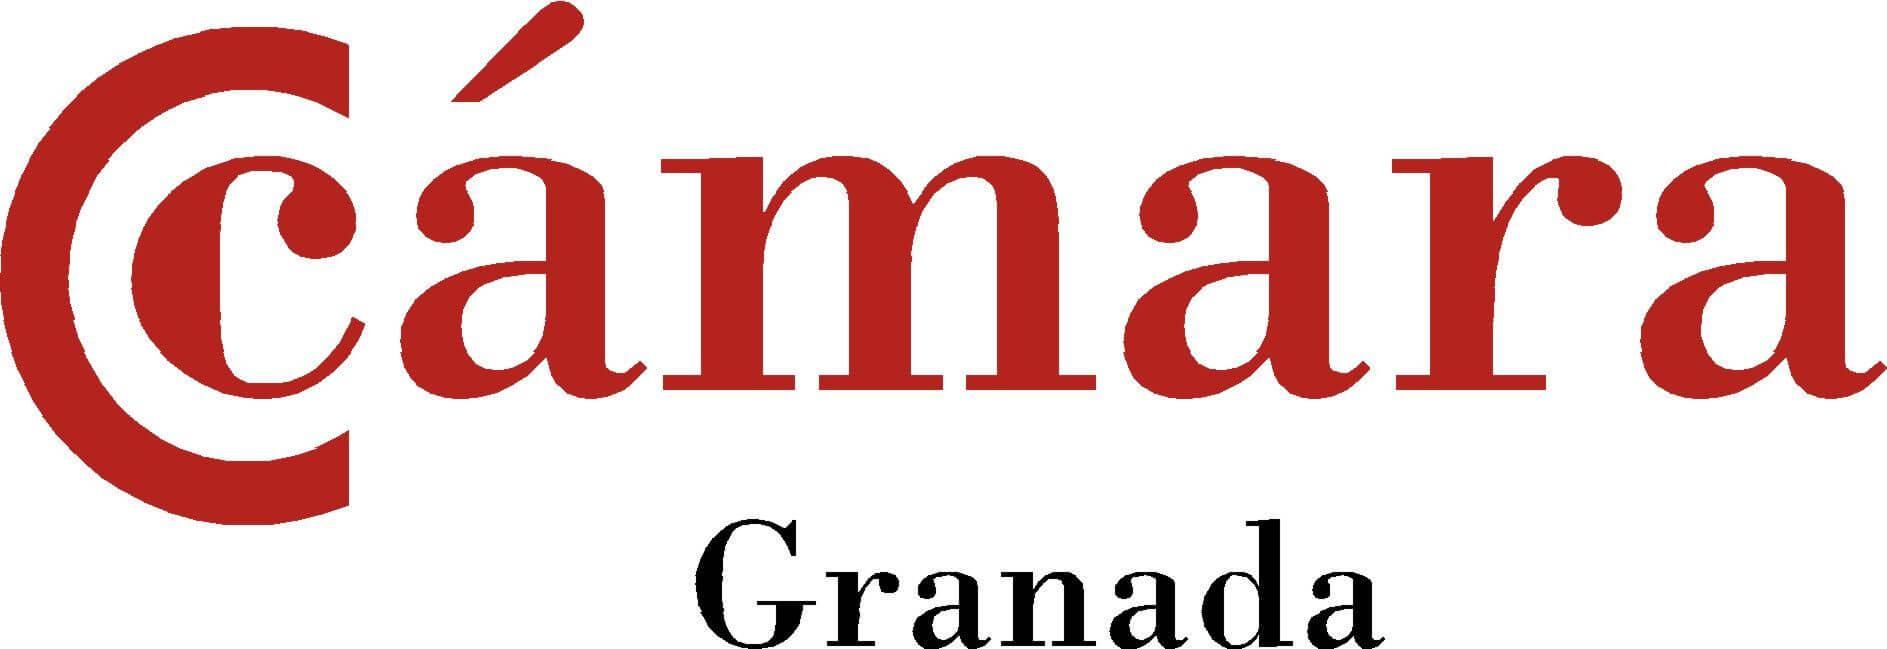 logotipo camara granada